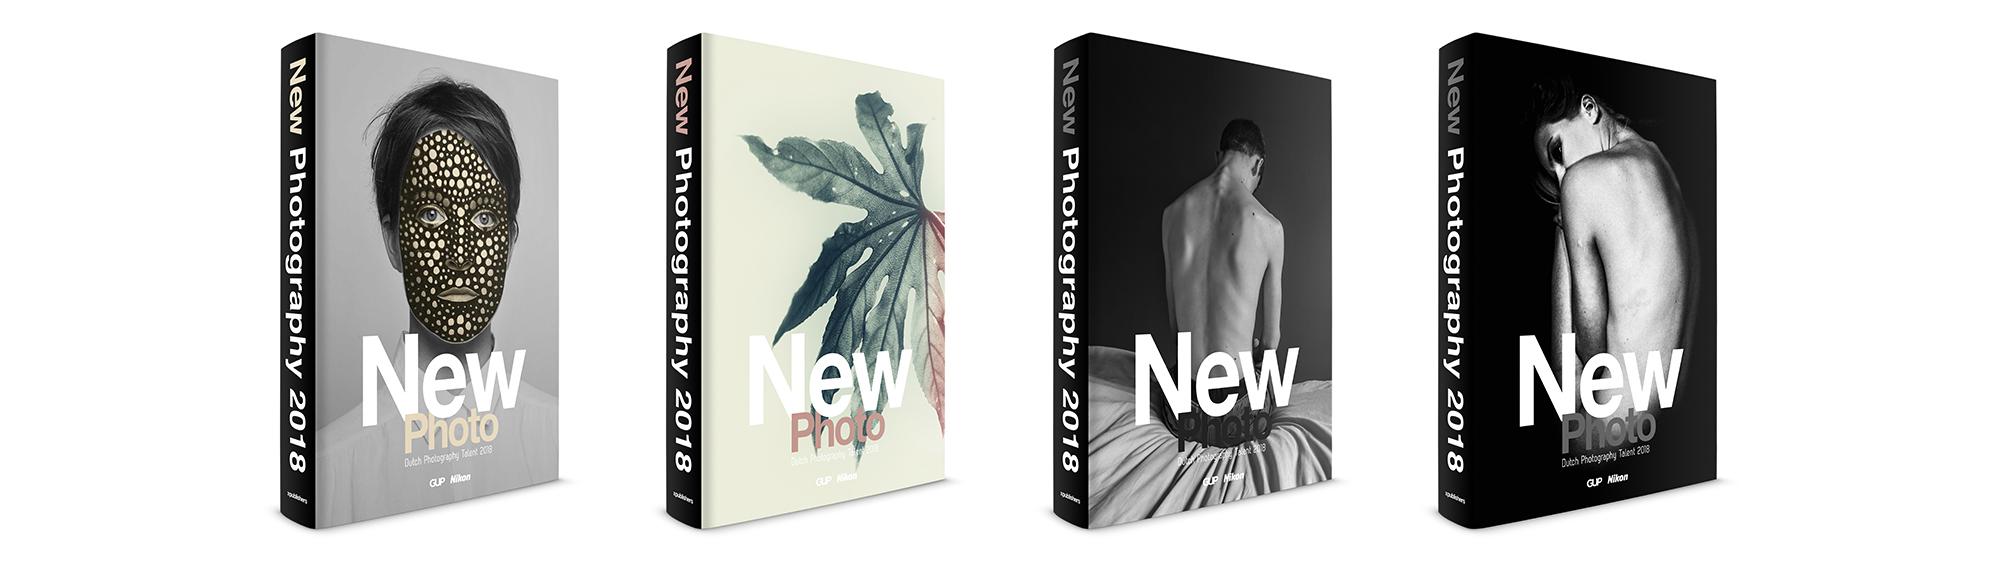 Introduction by Roy Kahmann  Cover images © Diederick Bulstra / Marijke de Schepper / Miranda Schmitz / Paul Cupido